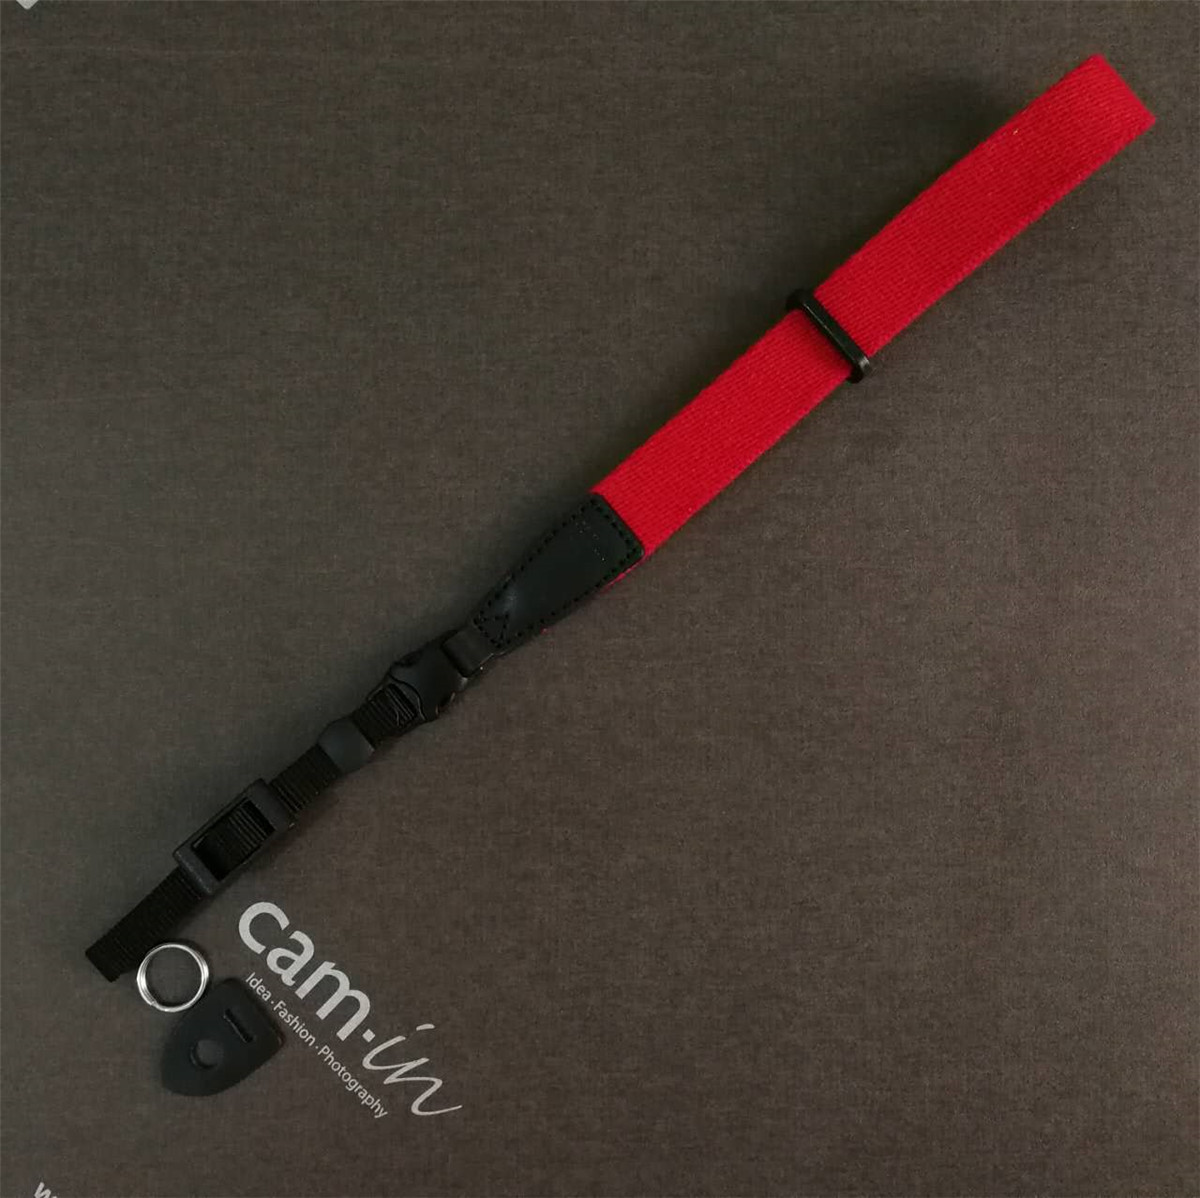 cam-in 棉质通用相机腕带 单反微单佳能尼康数码相机手带 CWS-004